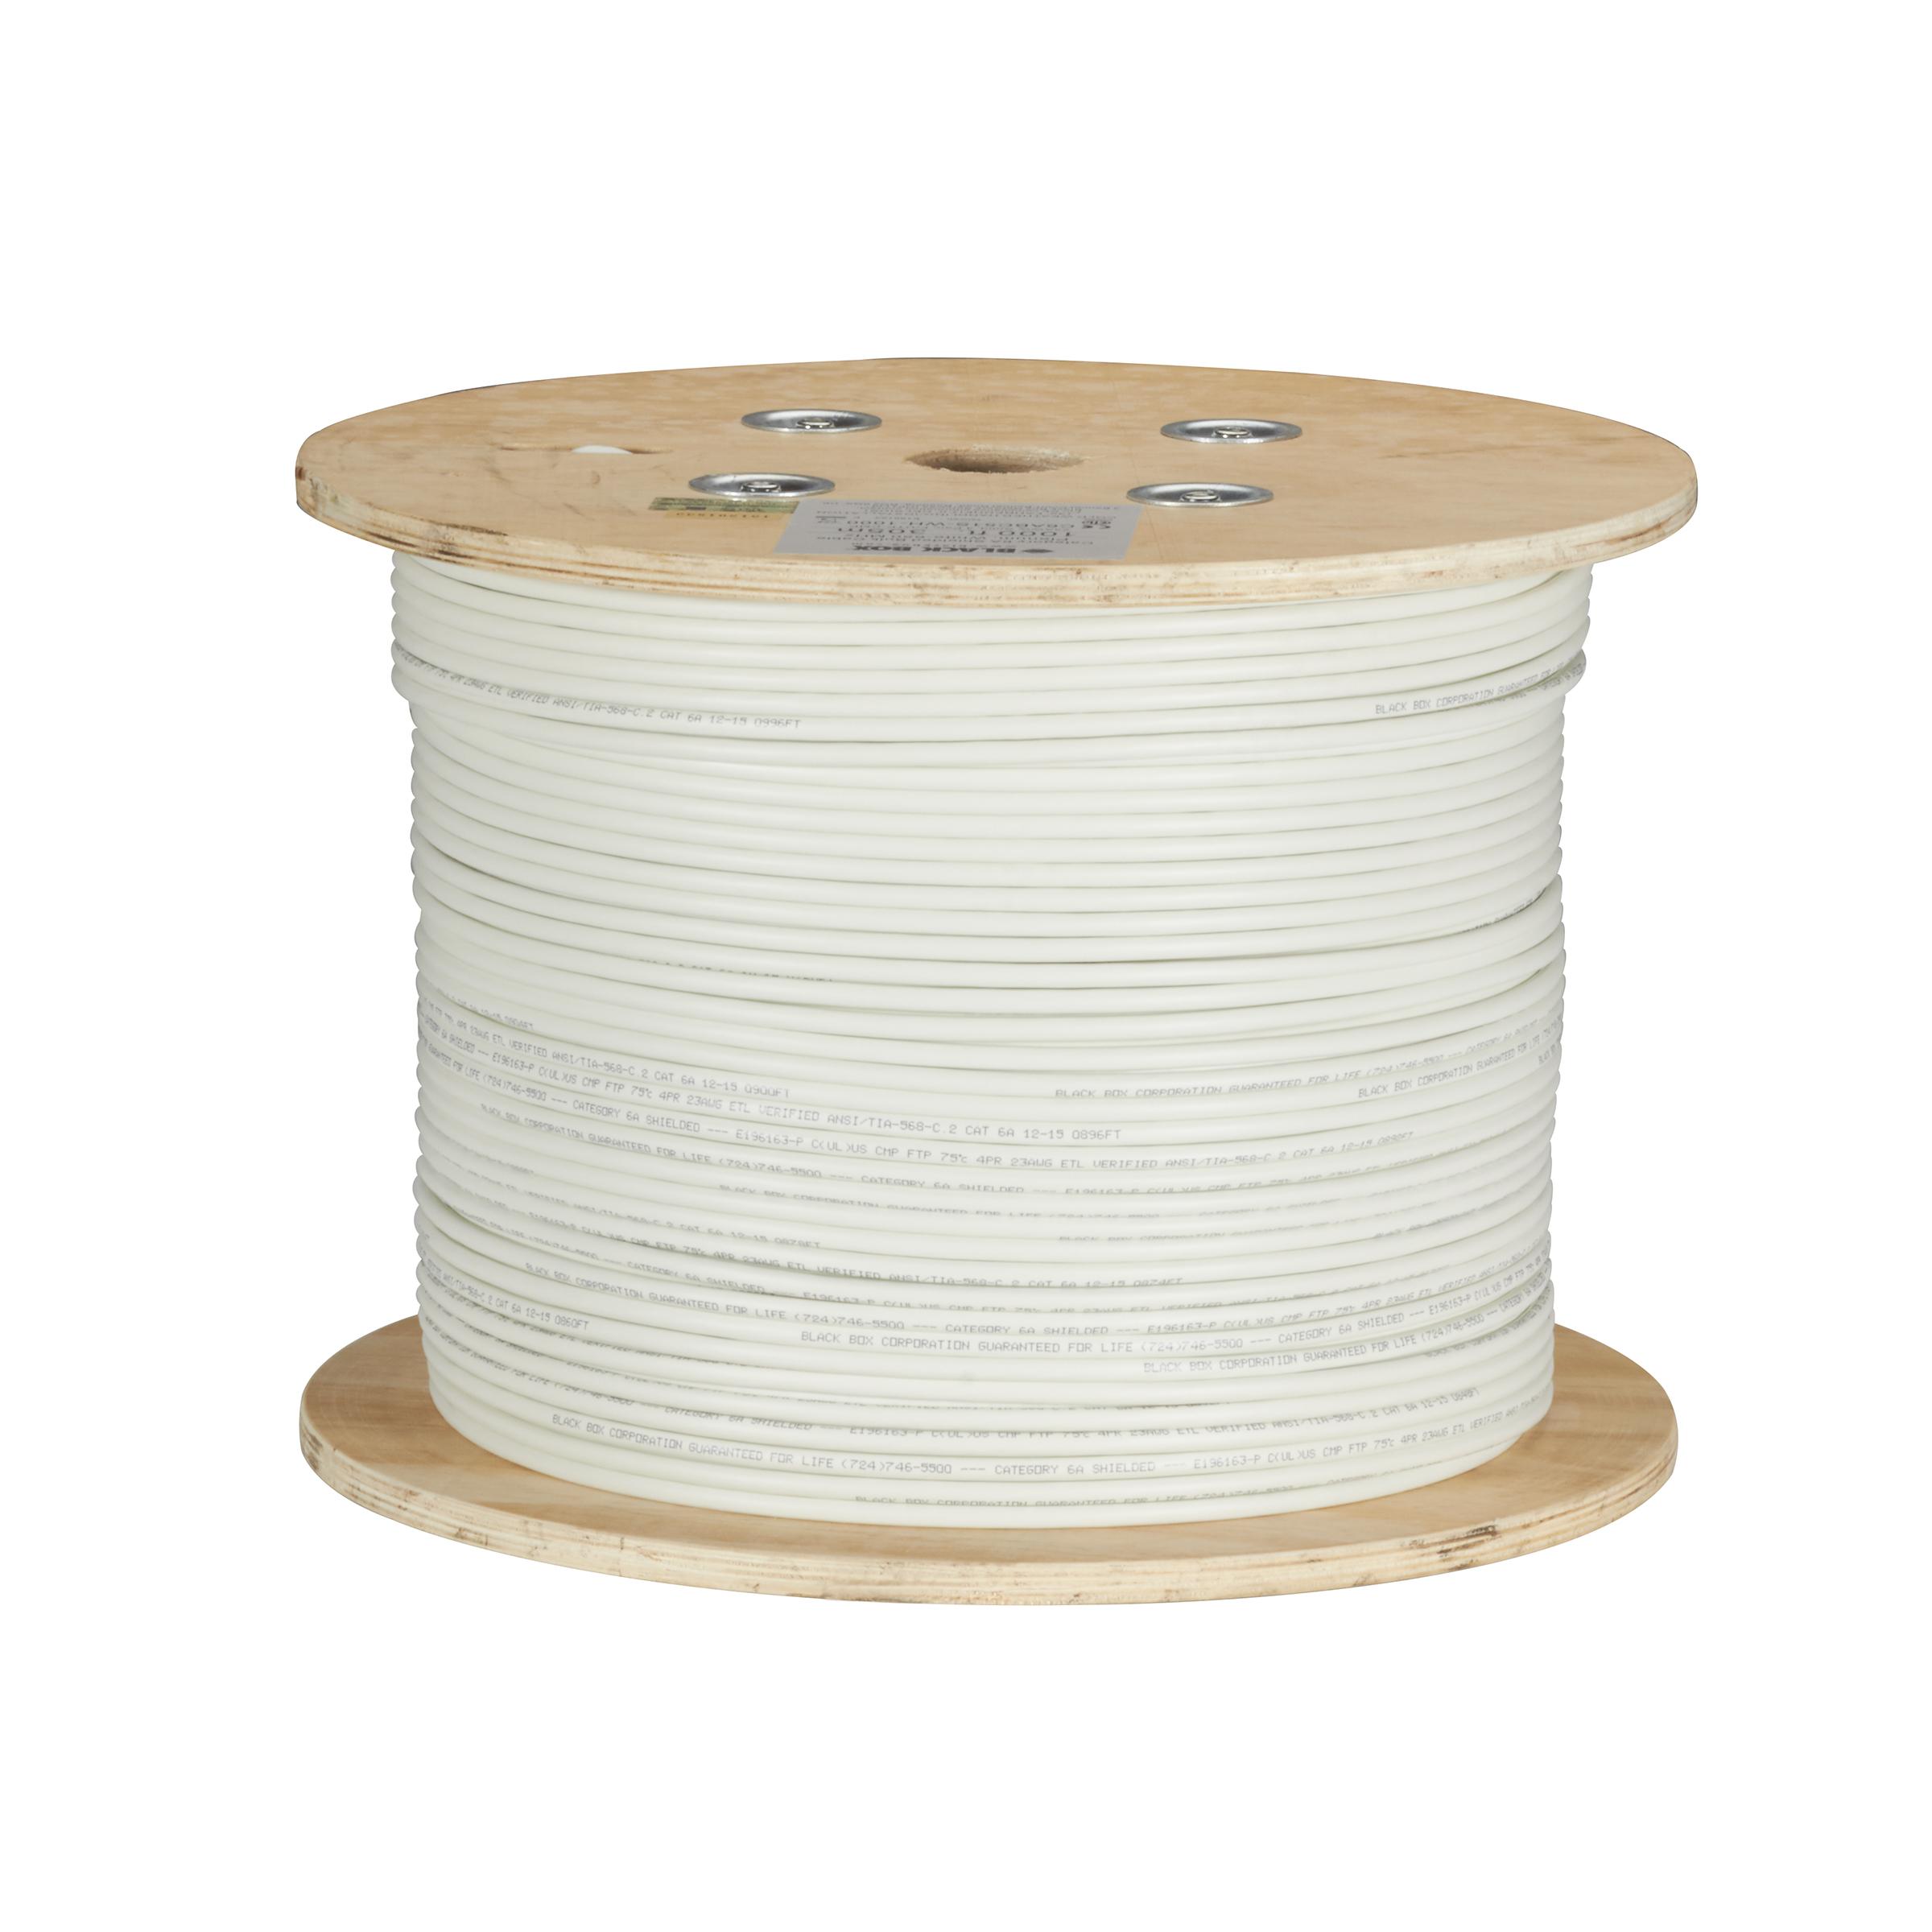 1000FT CAT6A 650MHz Solid Bulk Cable F/UTP CM White   Black Box